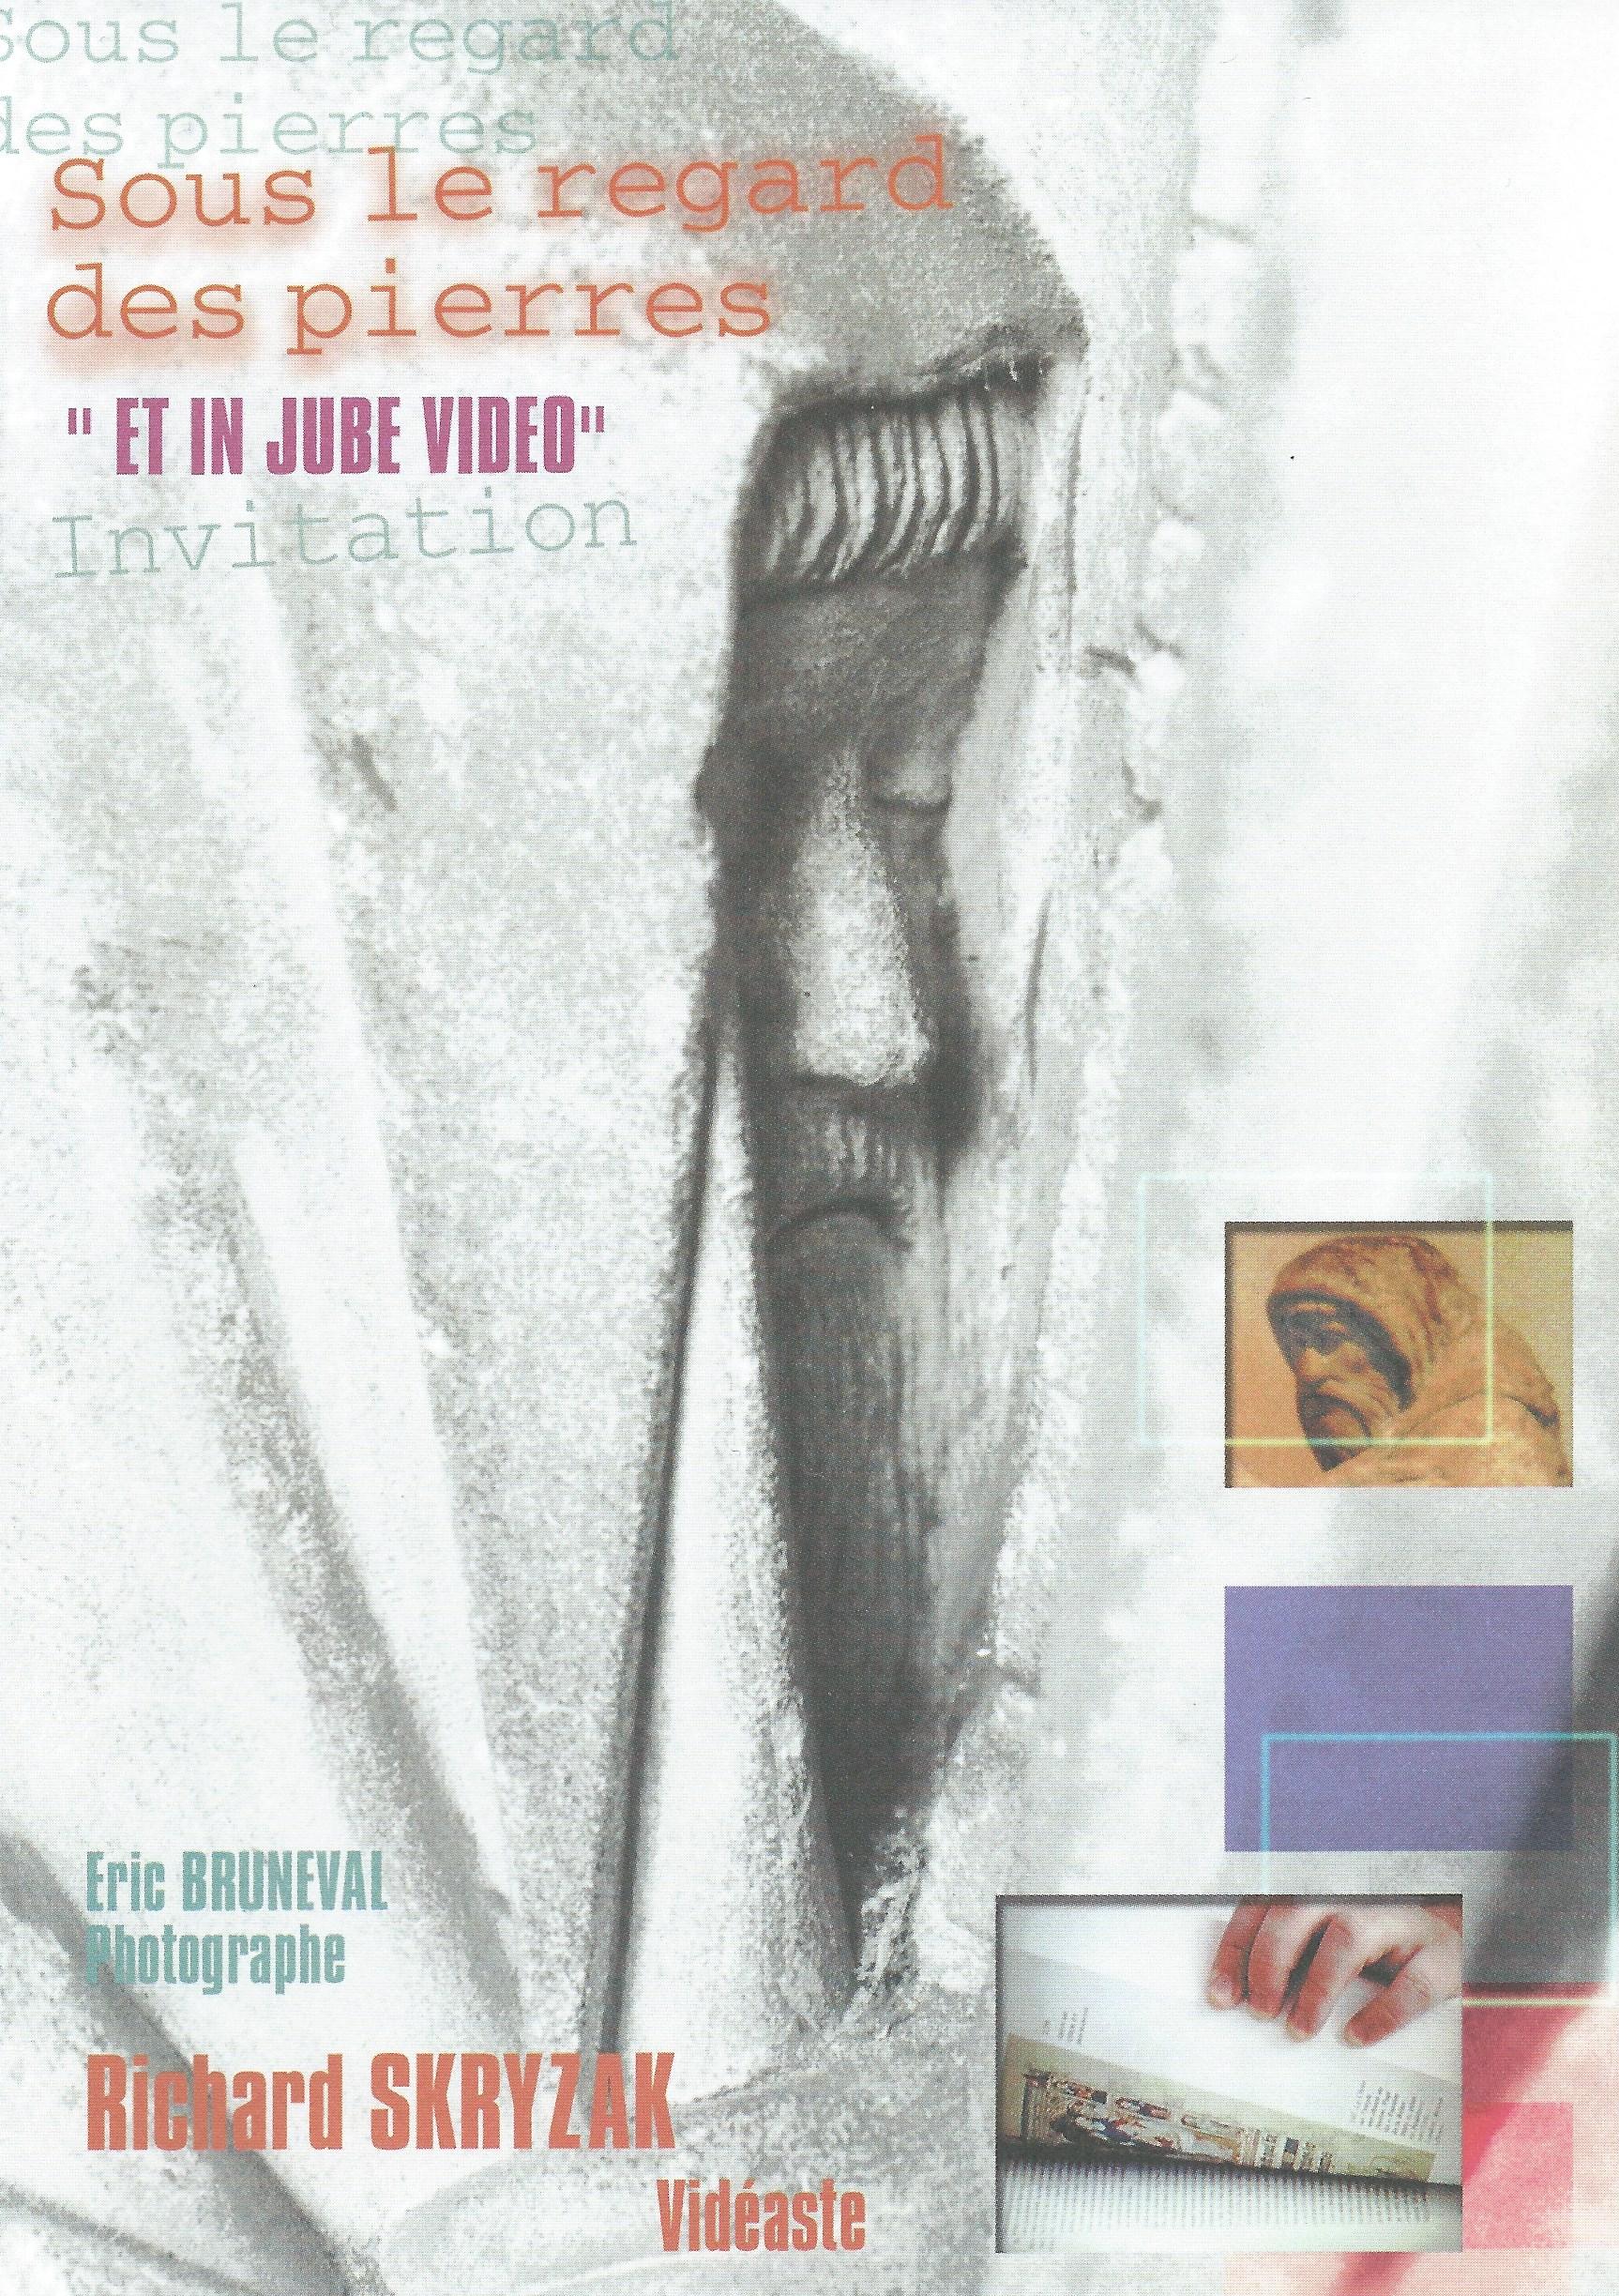 texte-et-in-jube-video-1